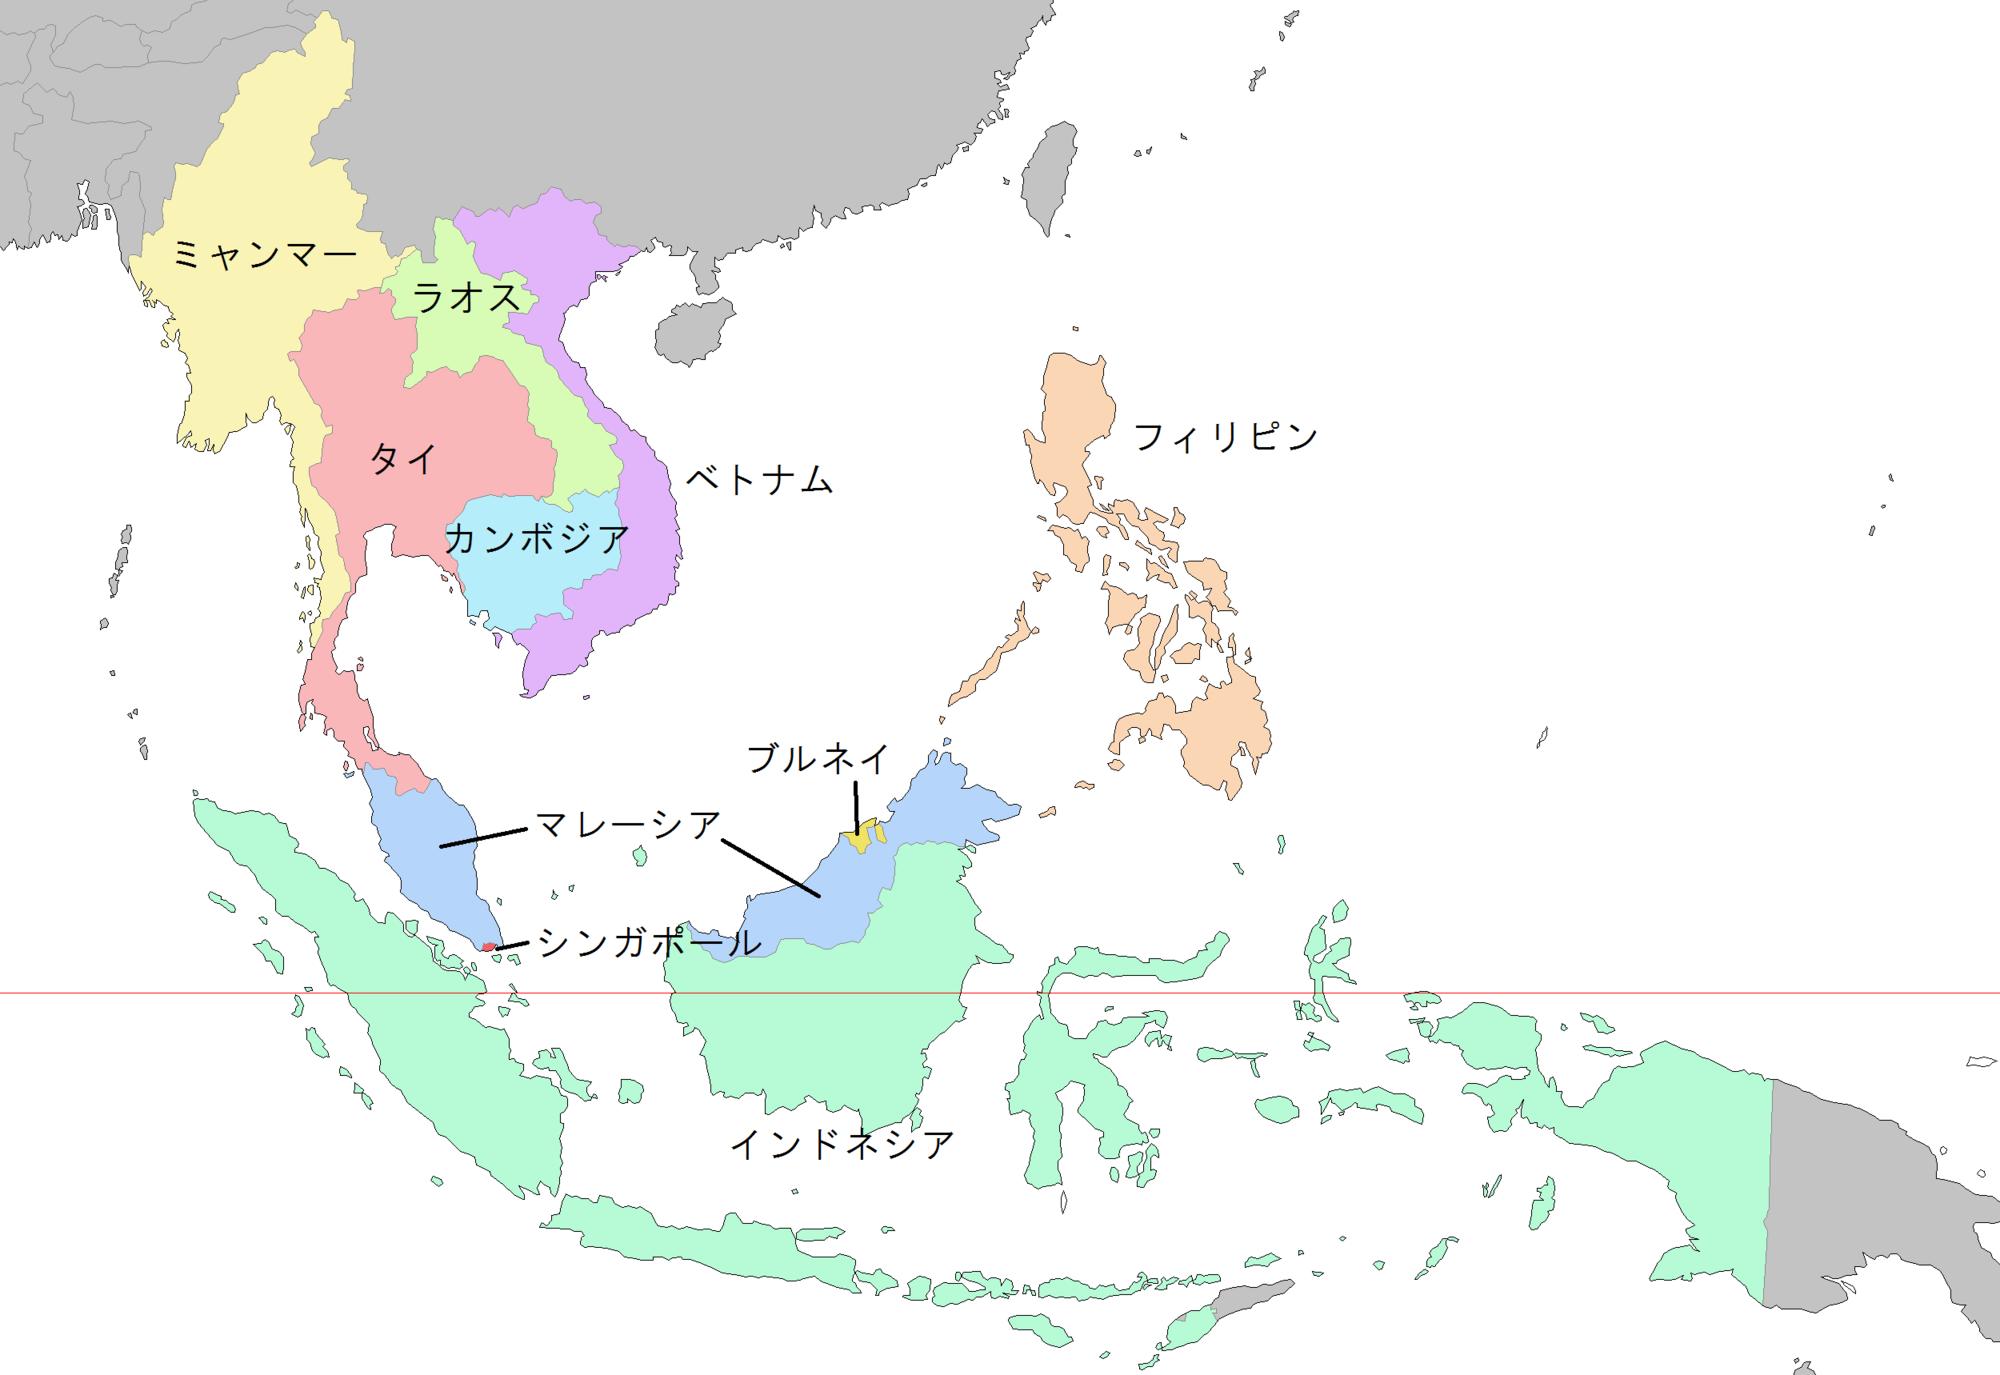 f:id:Yashio:20200820231848p:image:w500